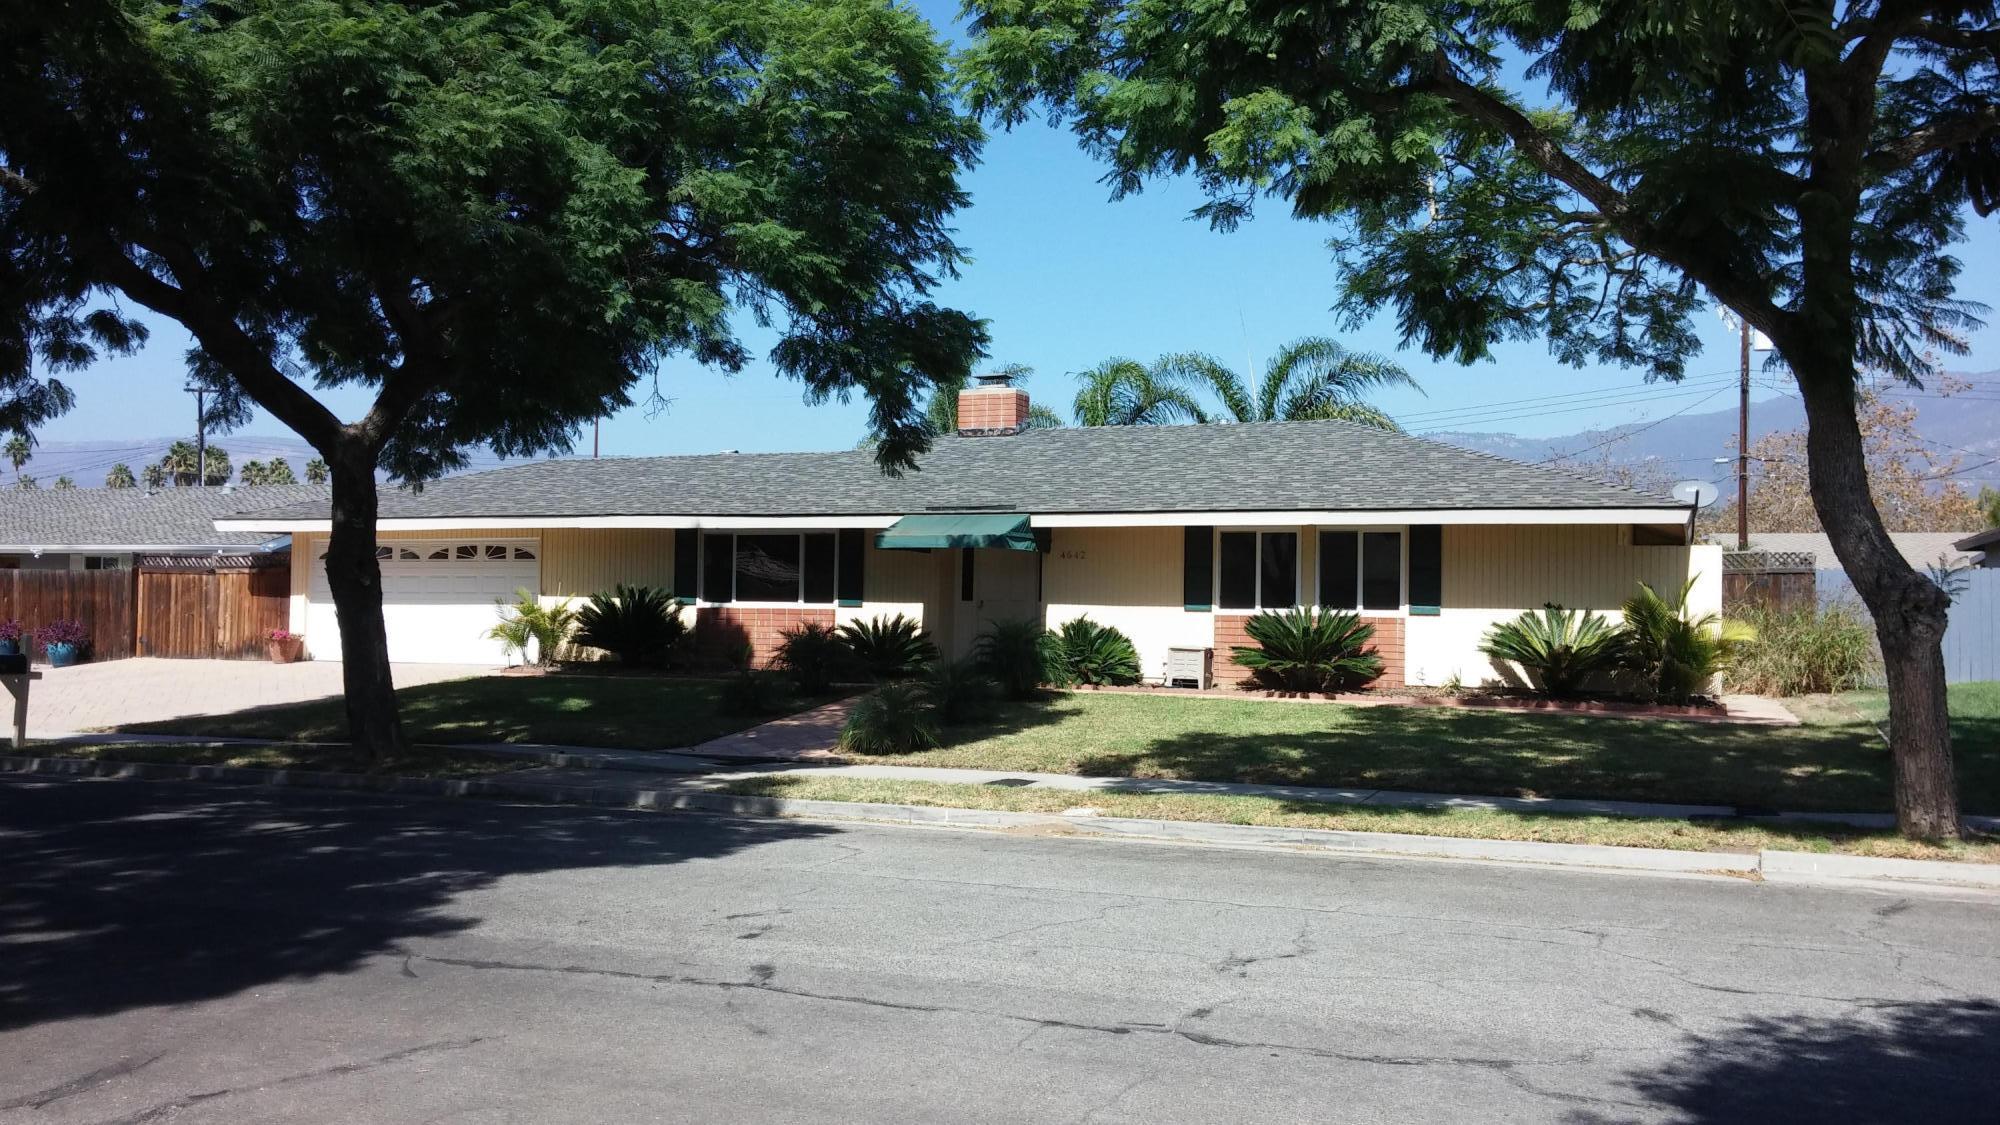 Property photo for 4642 Puente Plz Santa Barbara, California 93110 - 14-3101